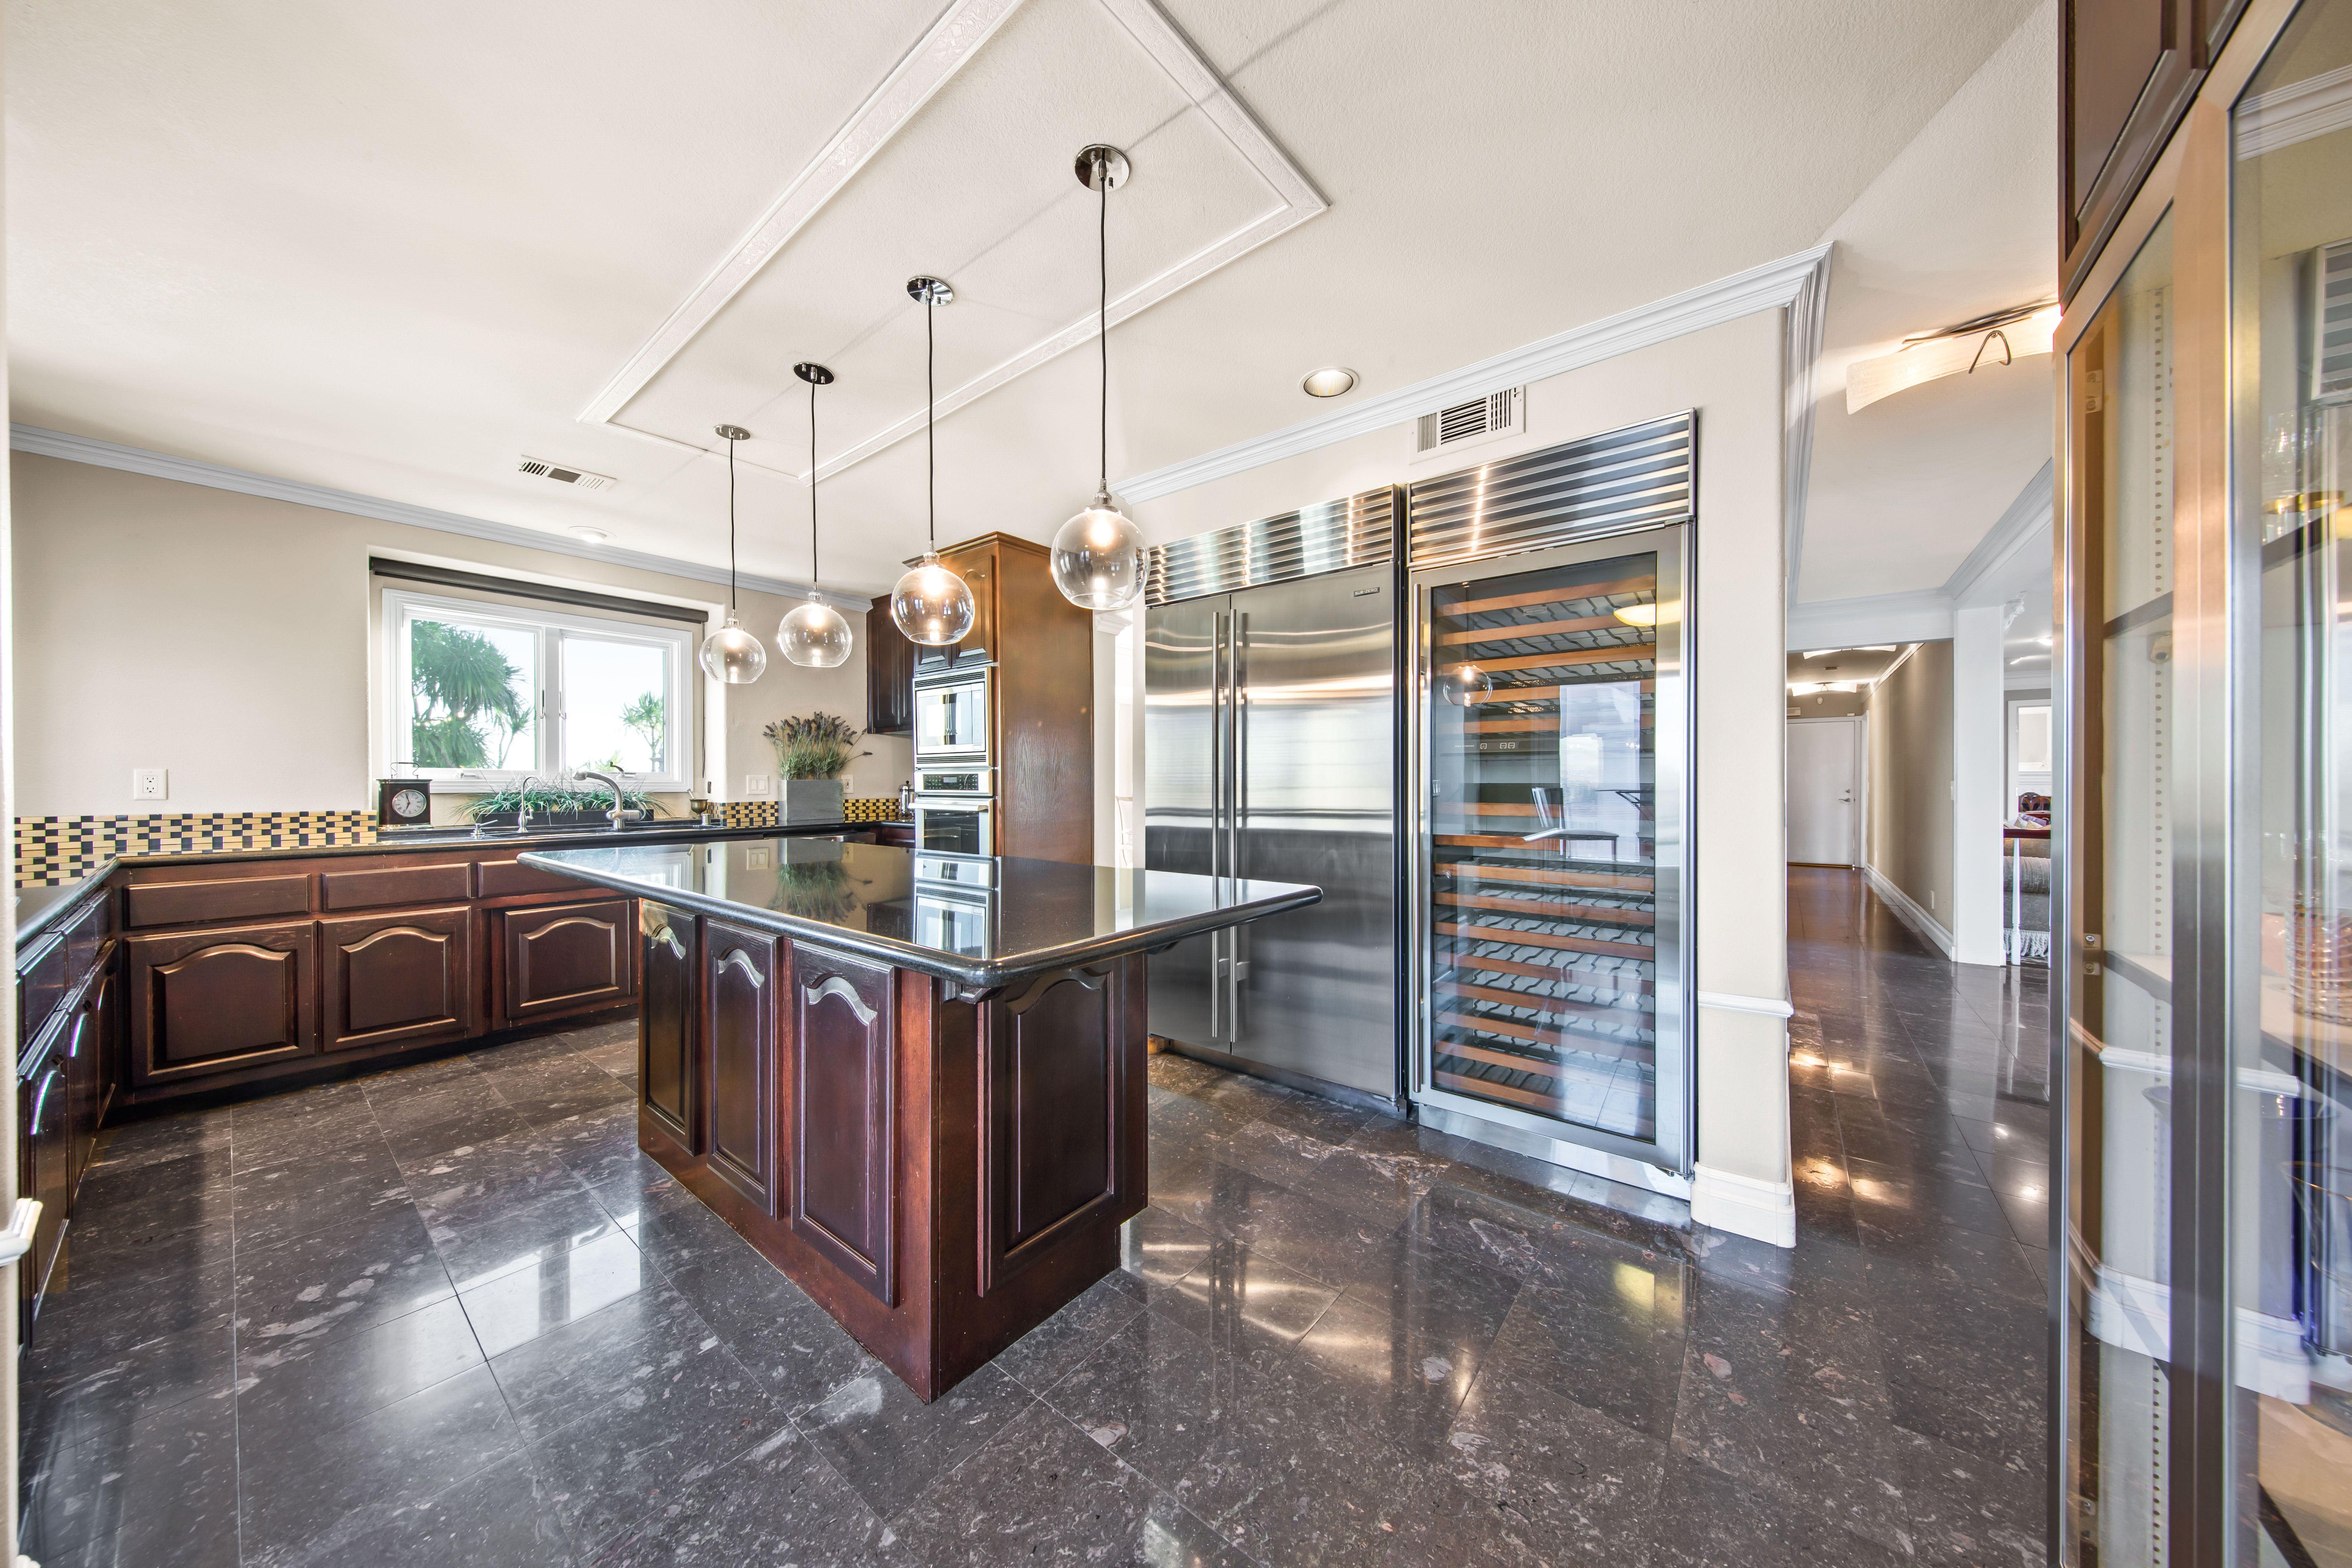 26710 Camino Seco Temecula Ca 92590 Cool Kitchens Dual Zone Wine Fridge Modern Kitchen